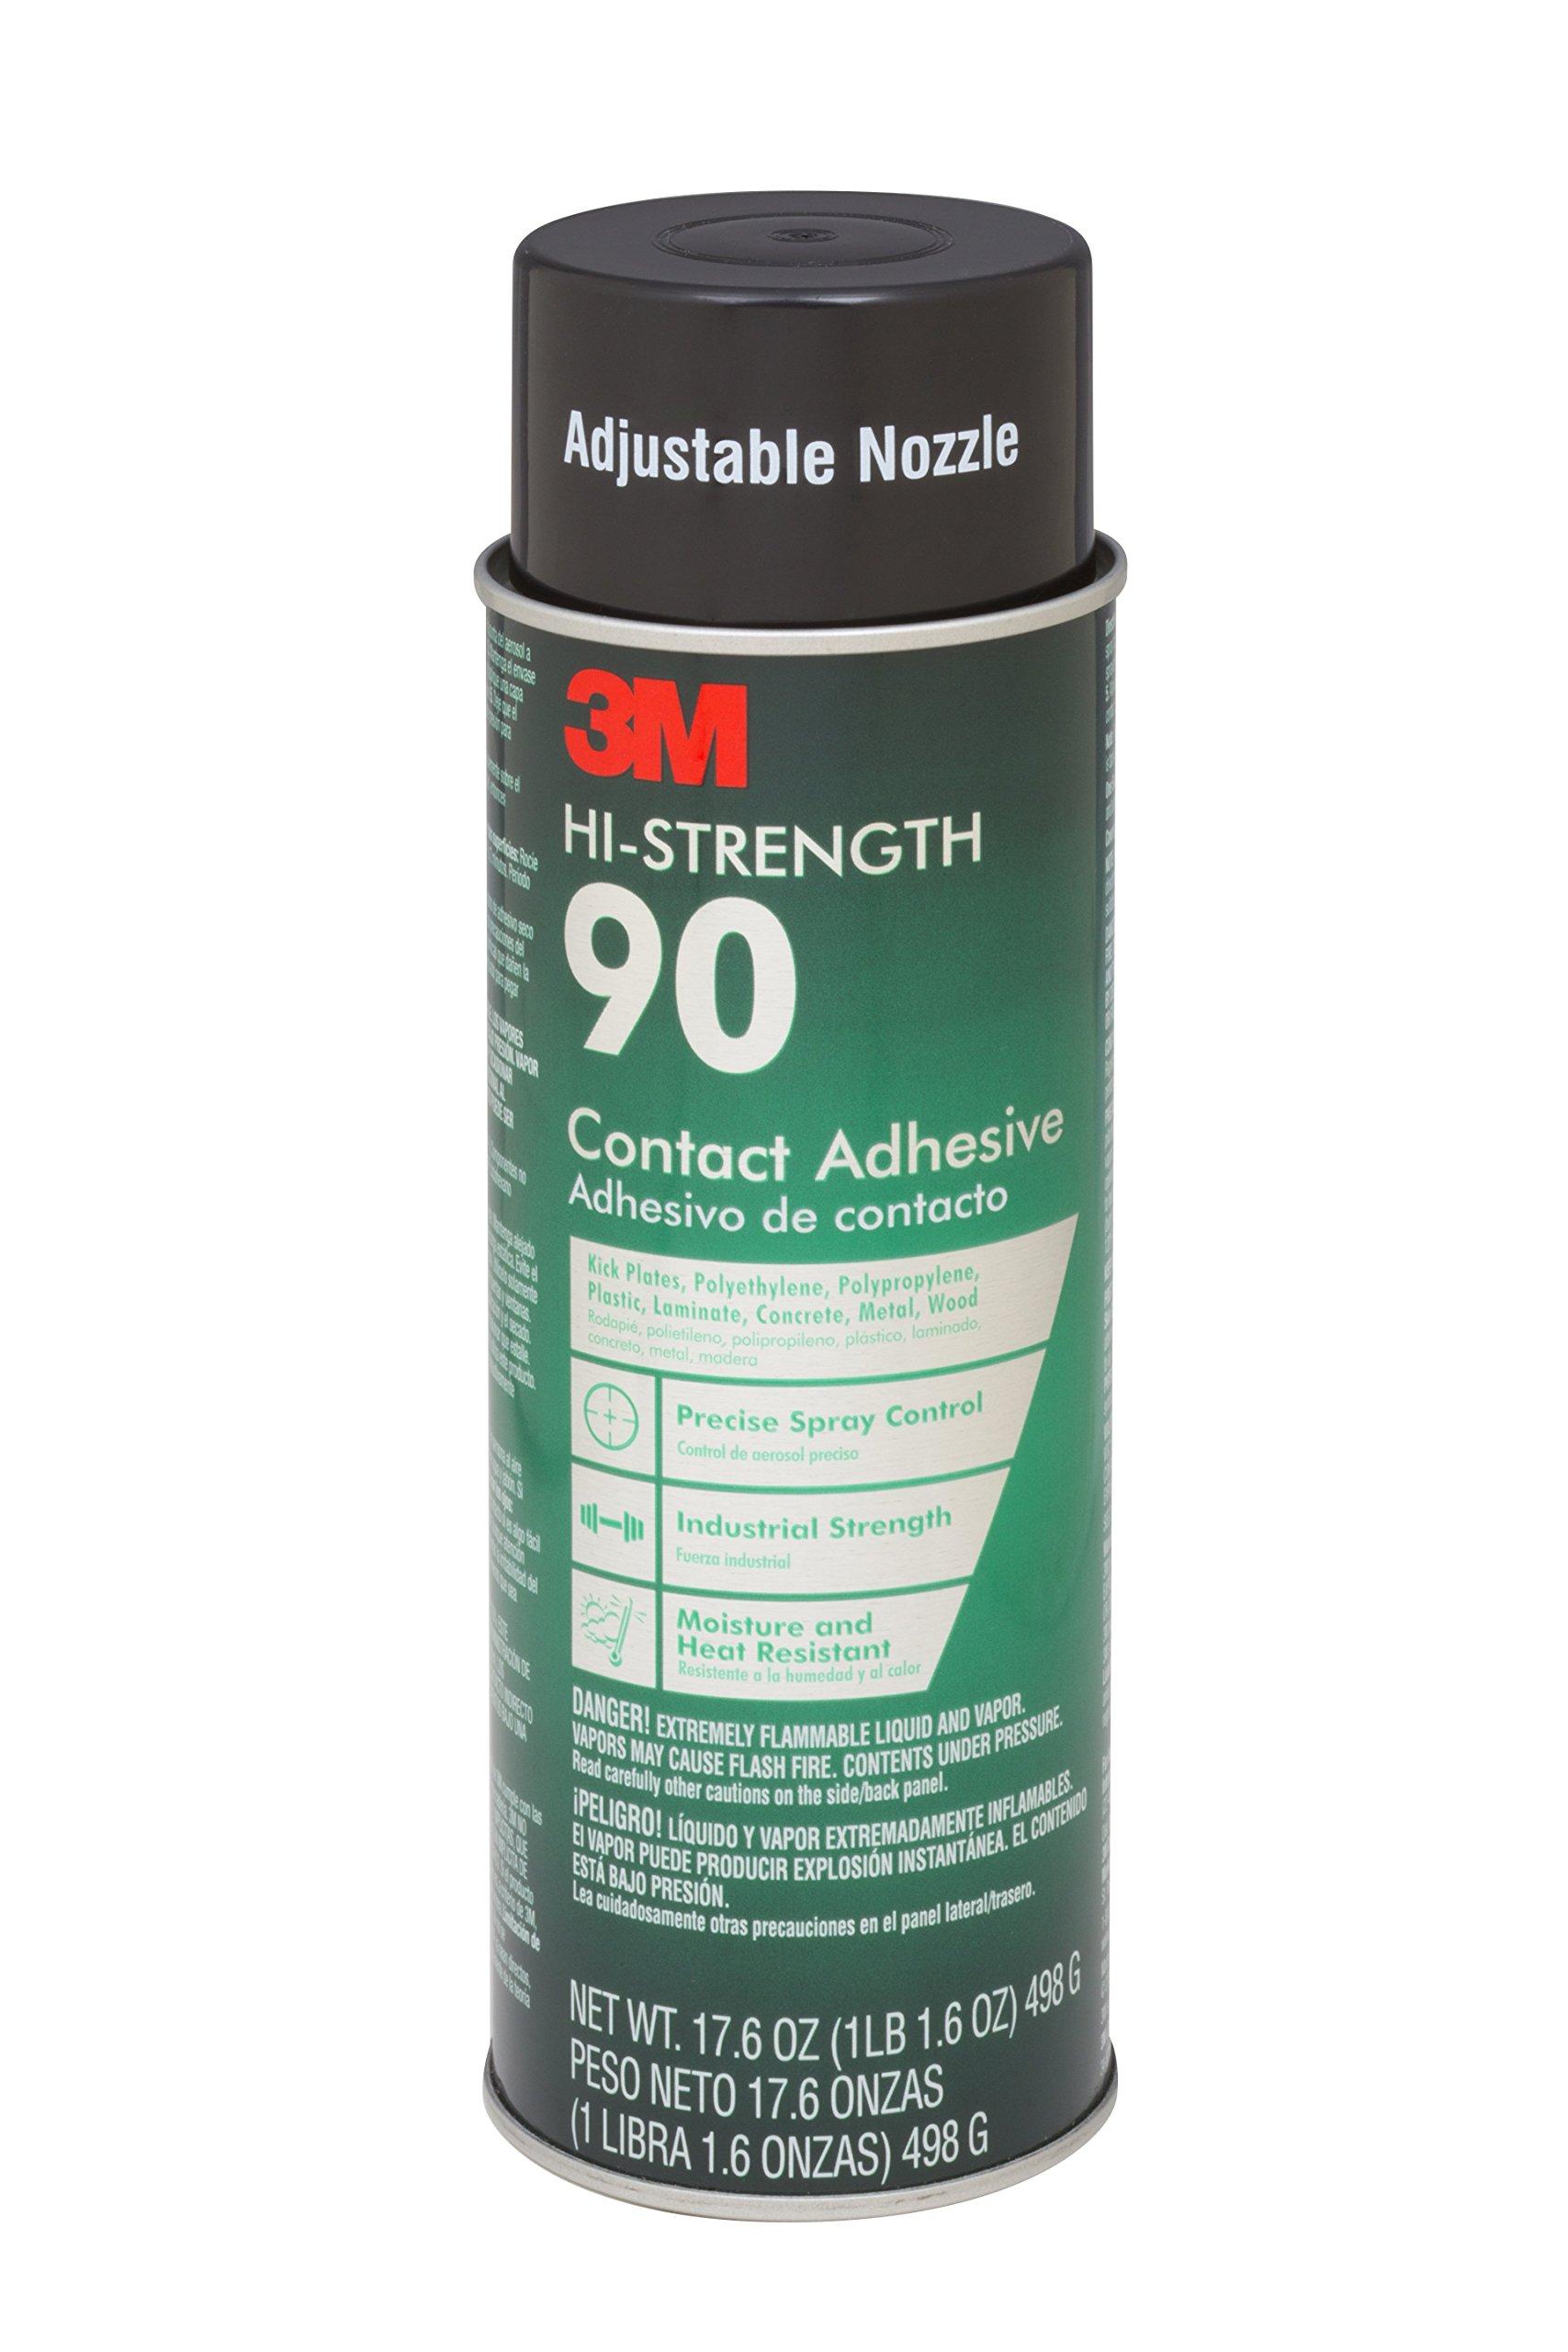 3M 90-24 Spray Adhesive, 17.60 Oz, 12 per Case by 3M